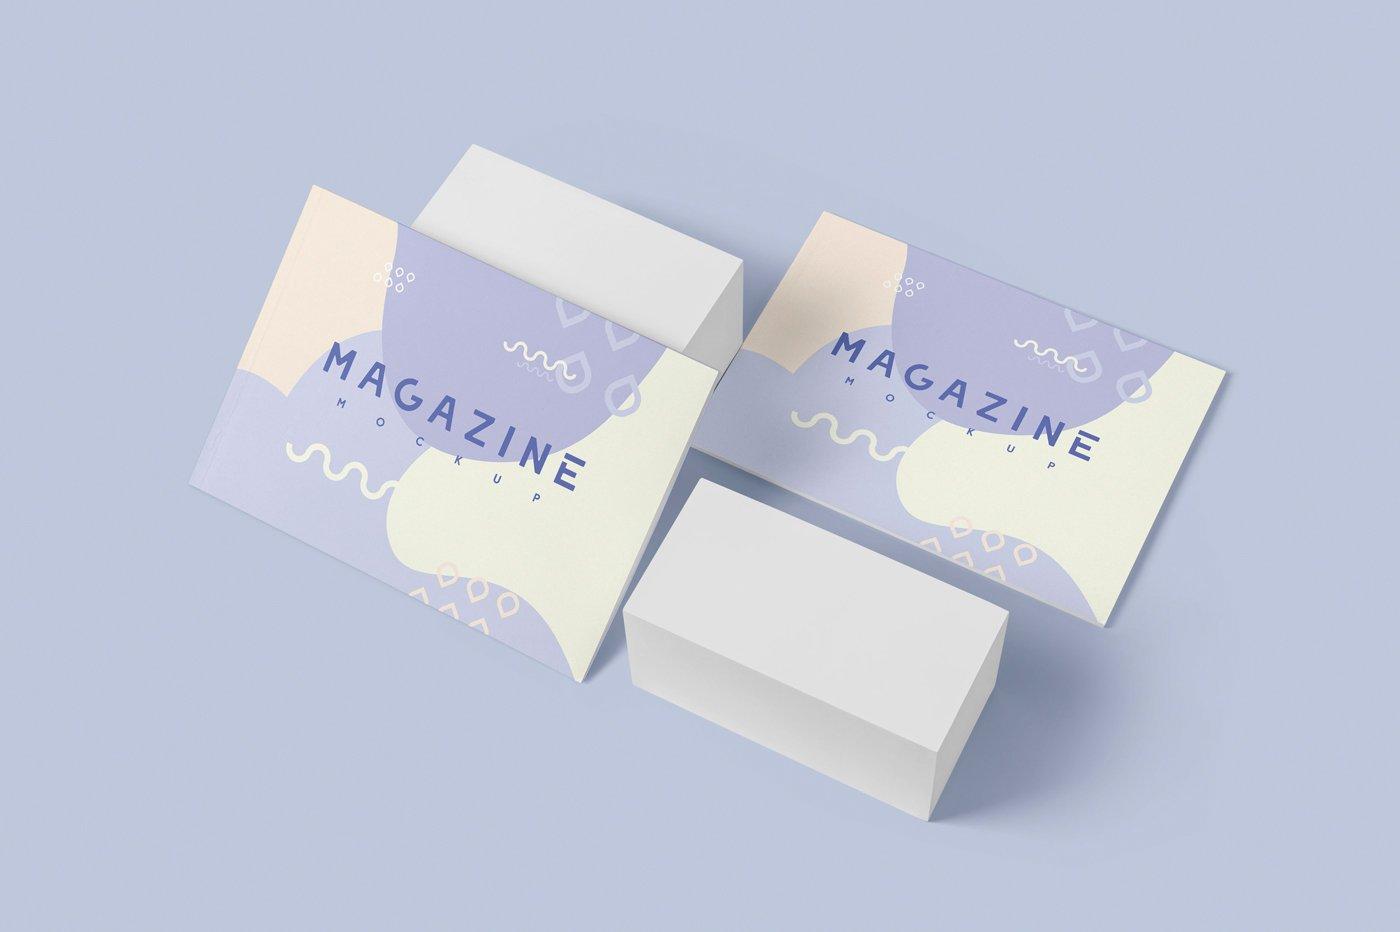 A4横版宣传画册设计展示样机 A4 Horizontal Brochure Mockups插图(4)